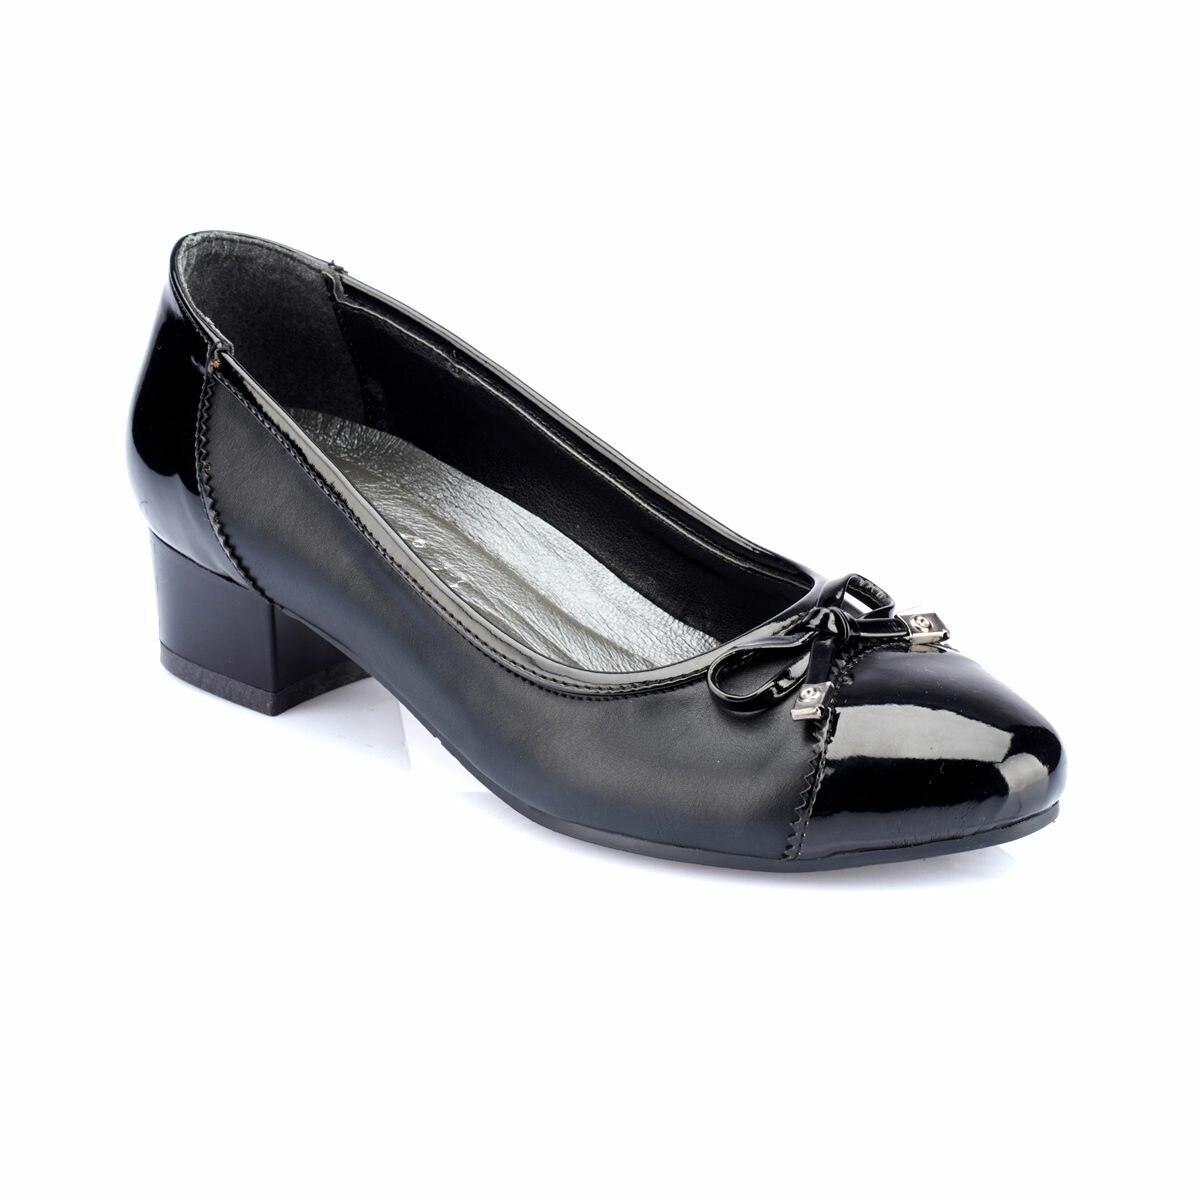 FLO 82.150073.Z Black Women Shoes Polaris